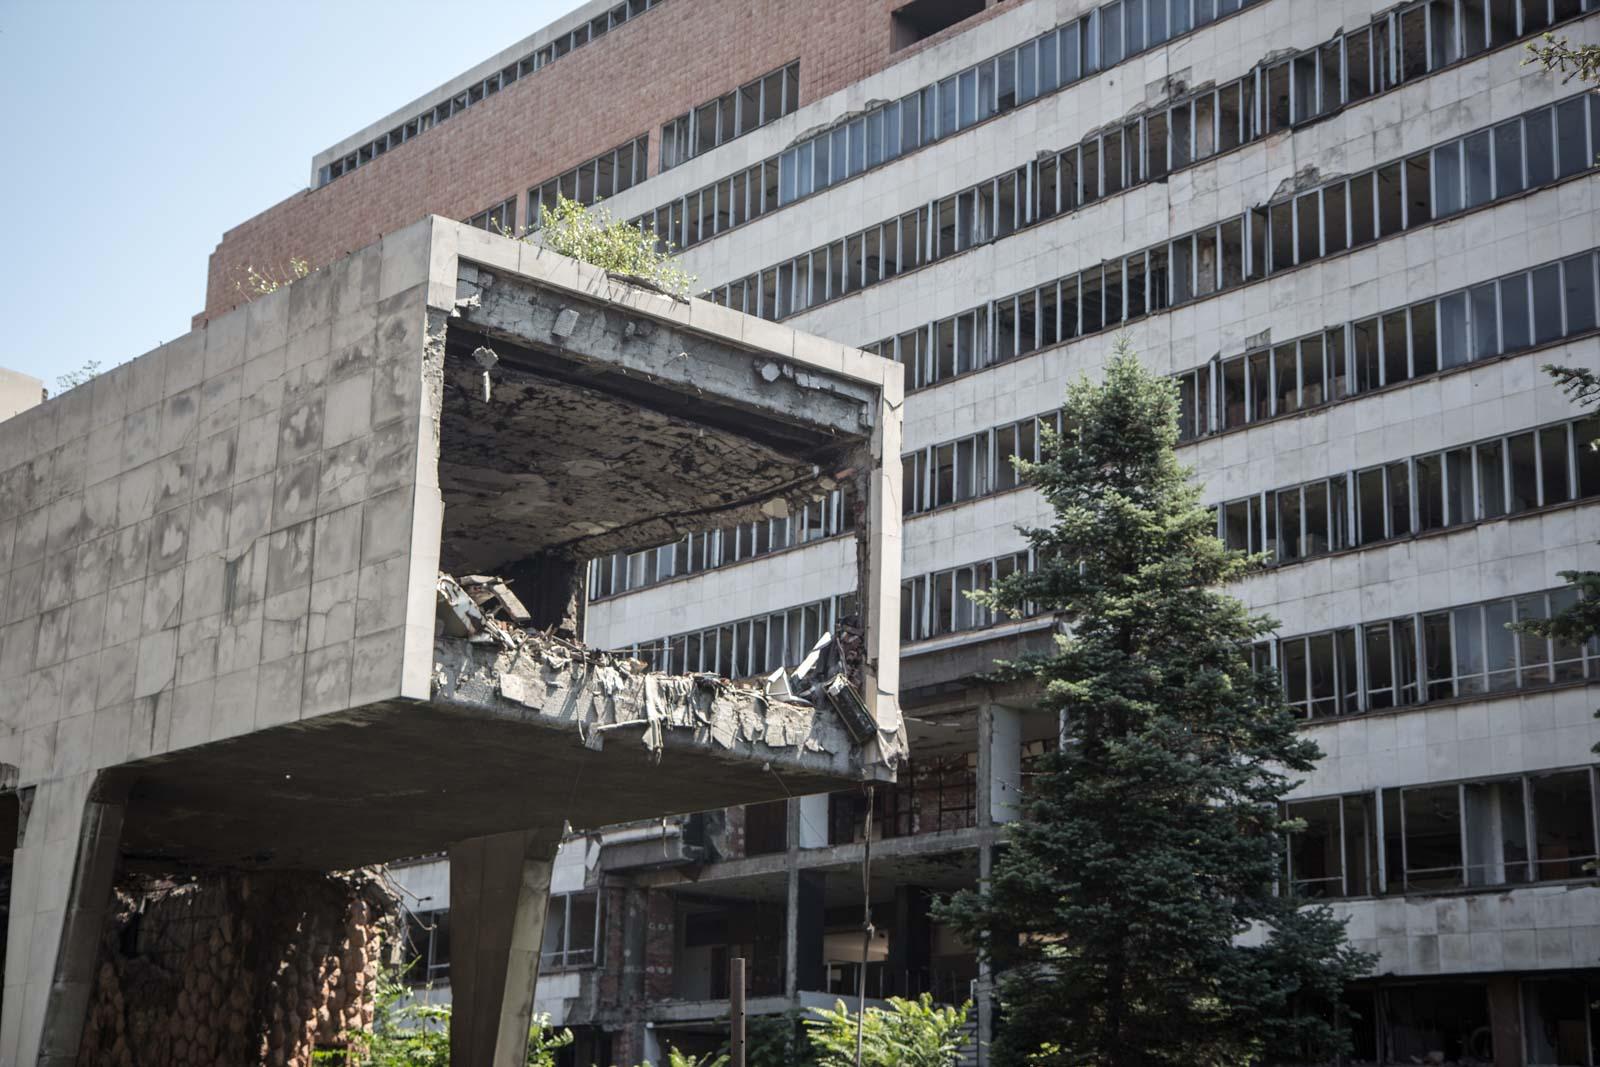 ruined buildings from belgrade bombings, serbia